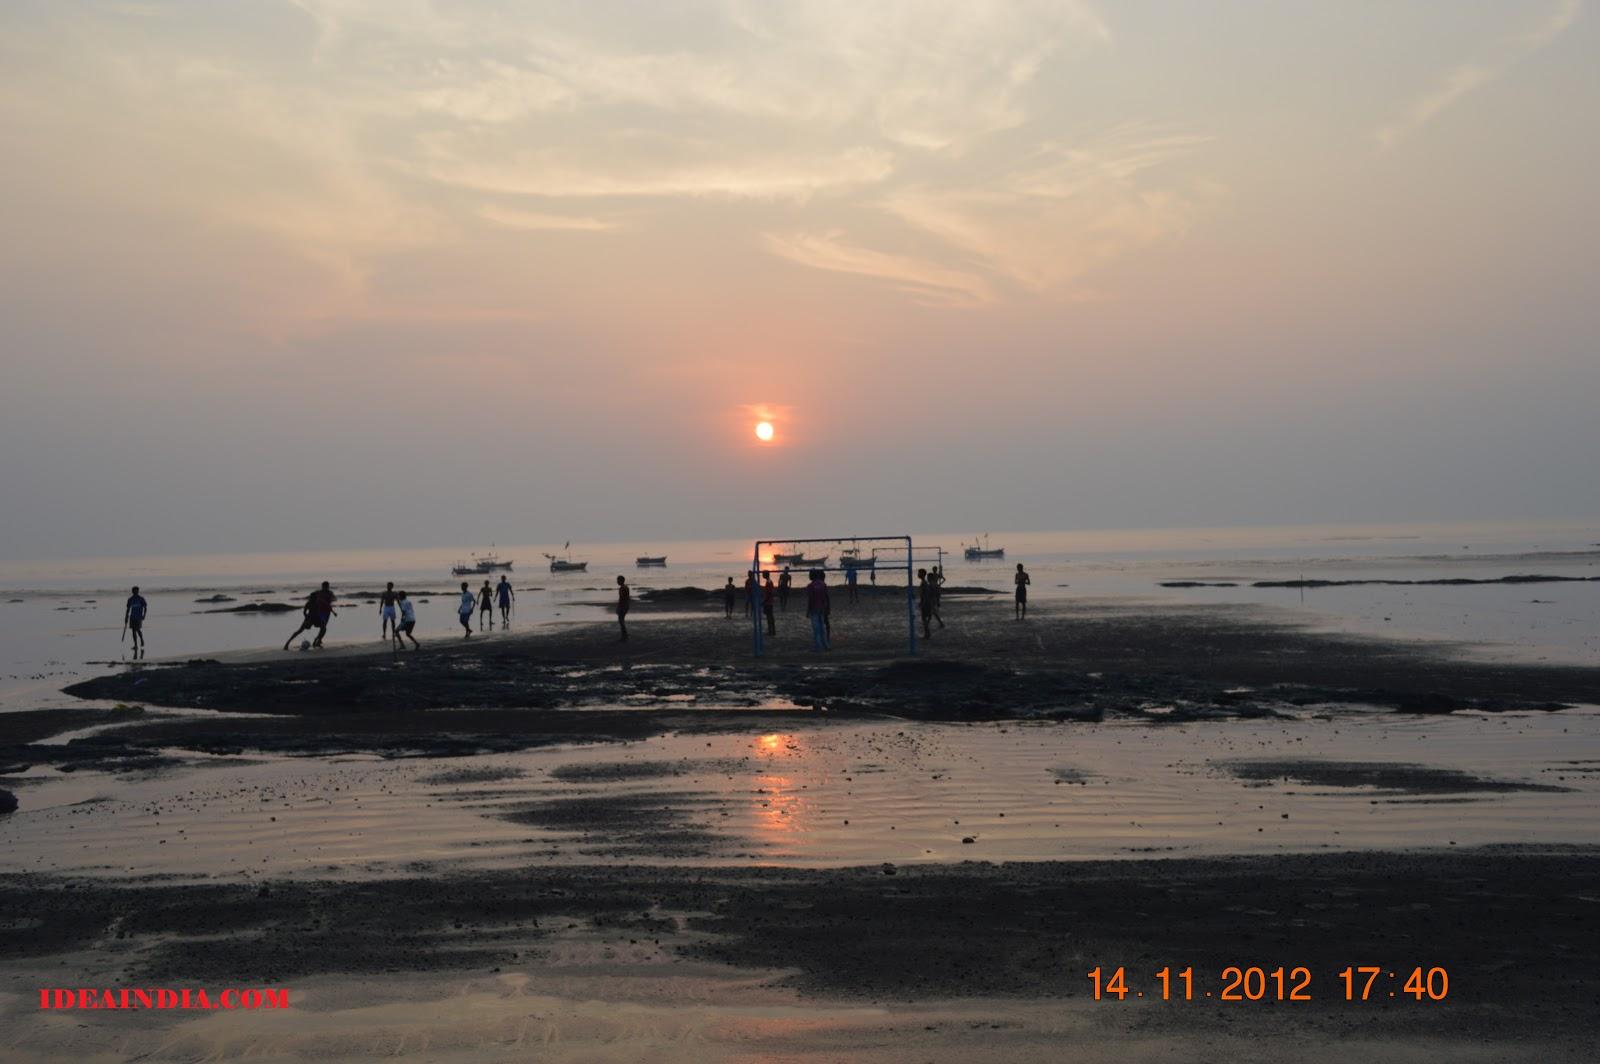 Beach soccer sunset